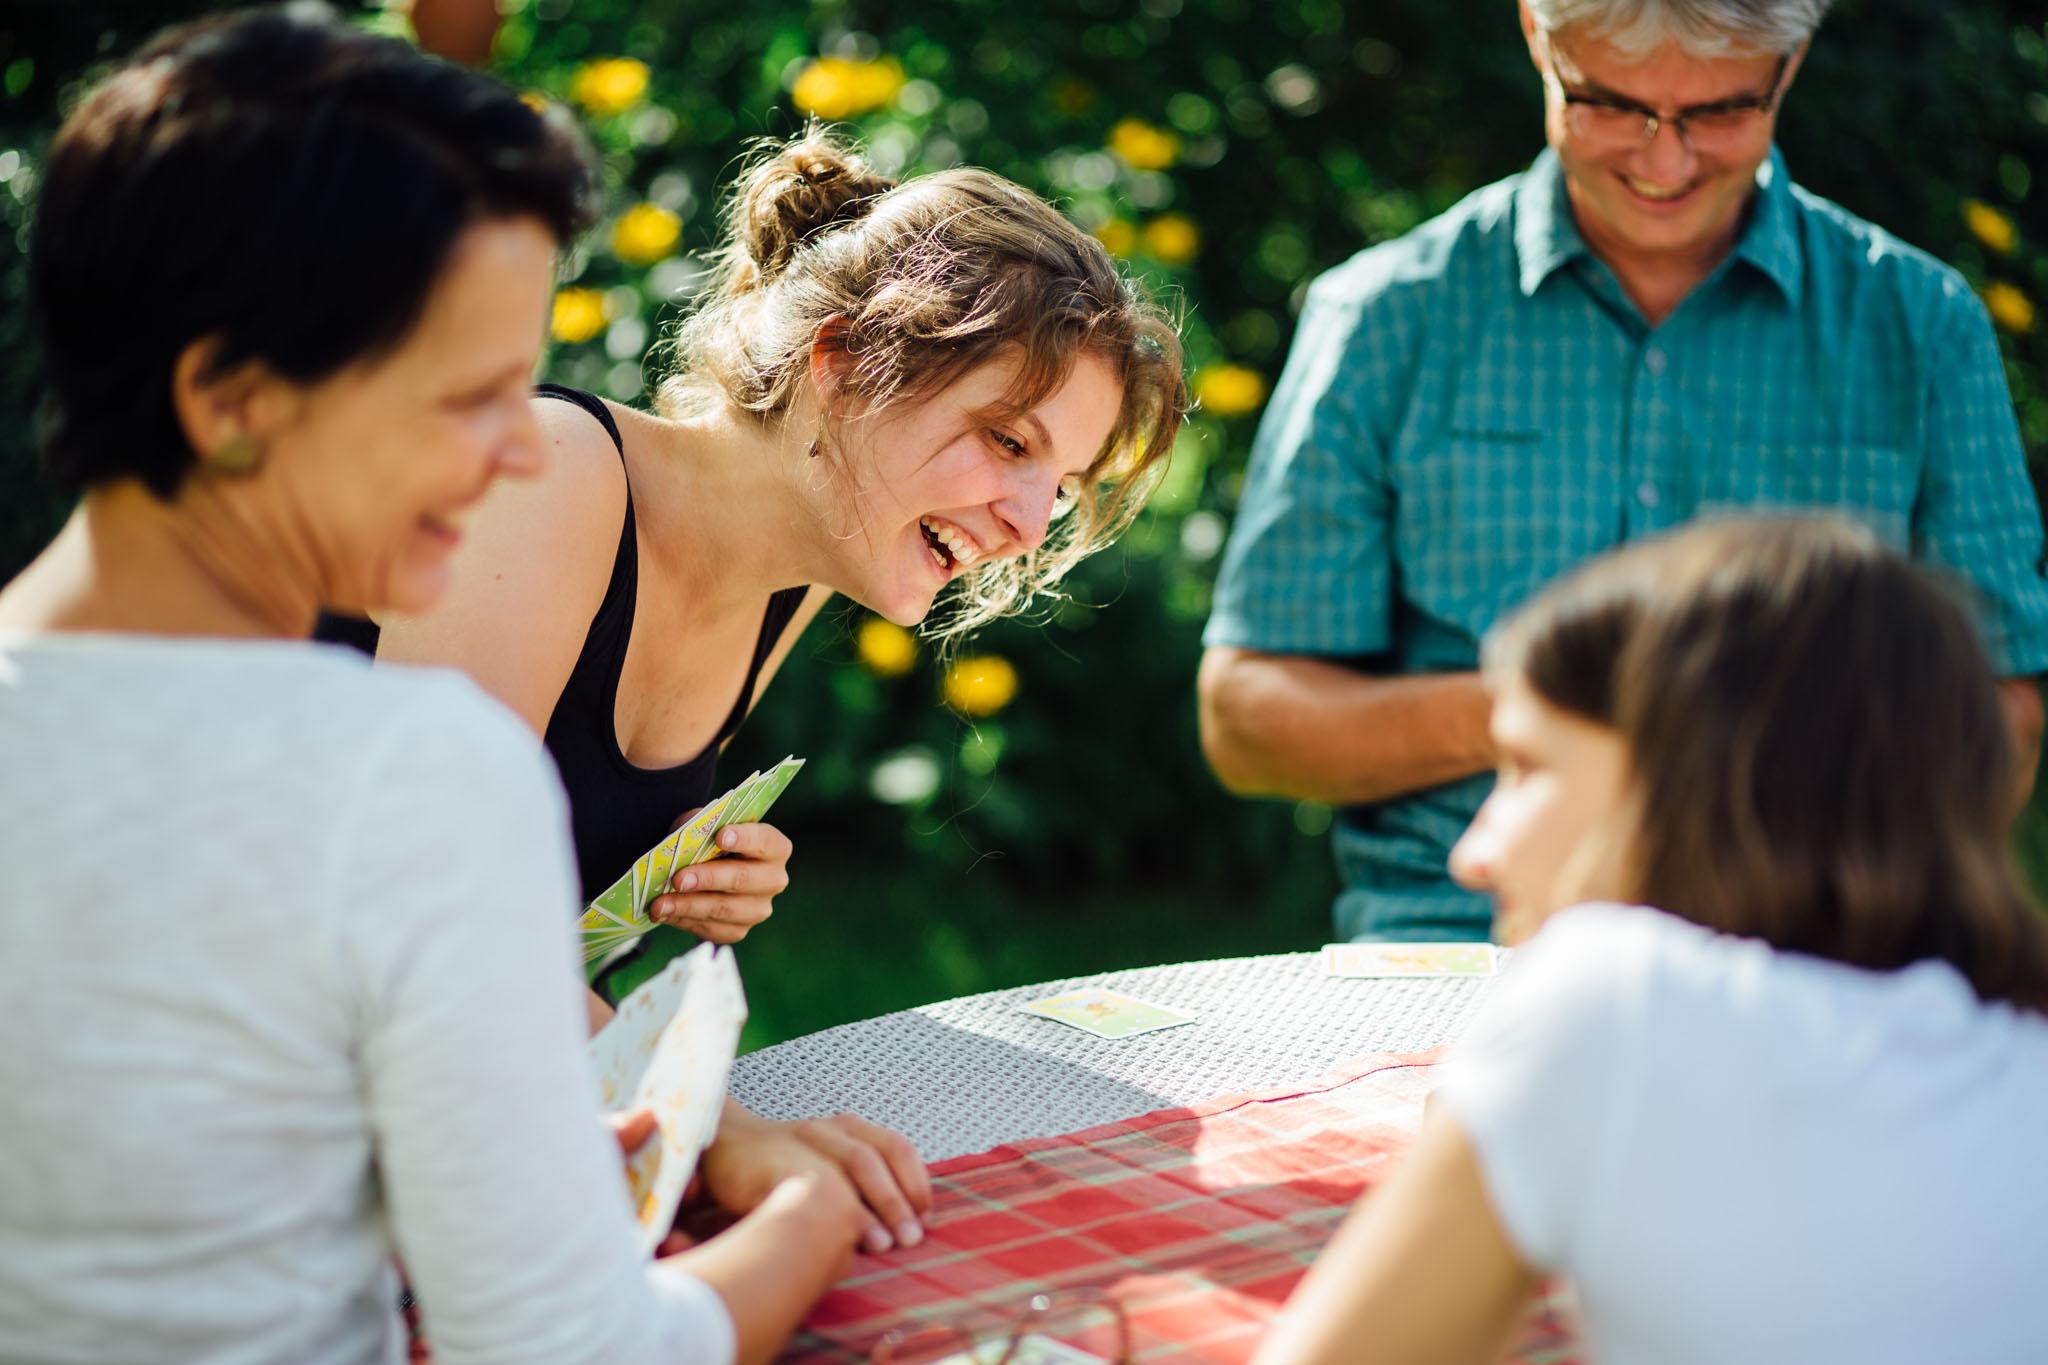 familienfotos-reportage-homestory-garten-kartenspiel